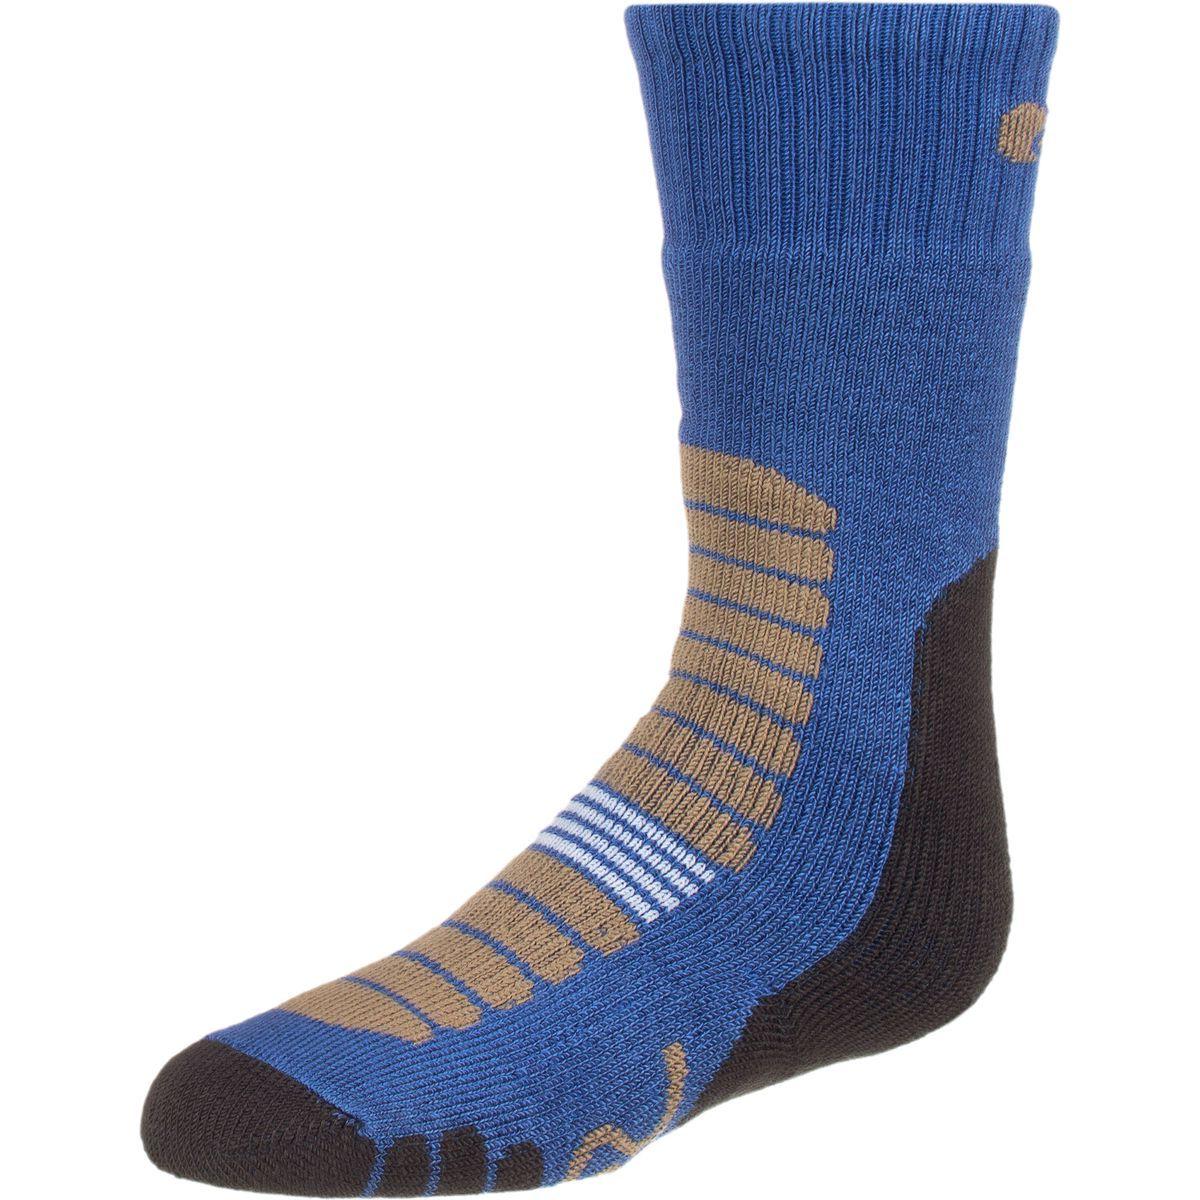 EURO Socks Board Supreme Jr Snowboard Sock - Boys'